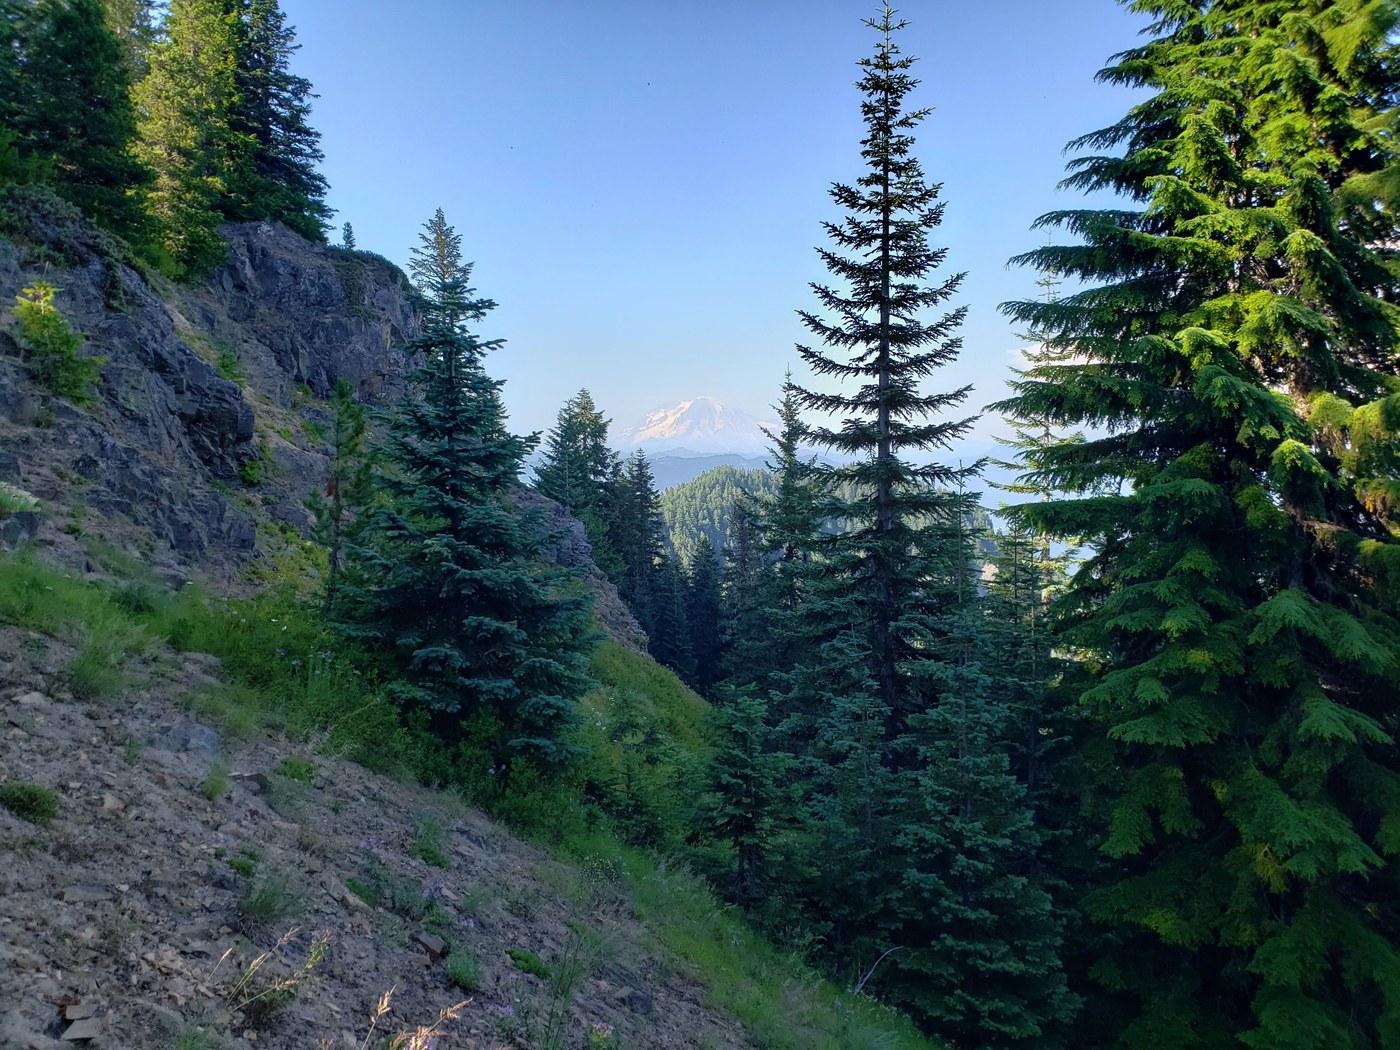 A view of Rainier through the trees.